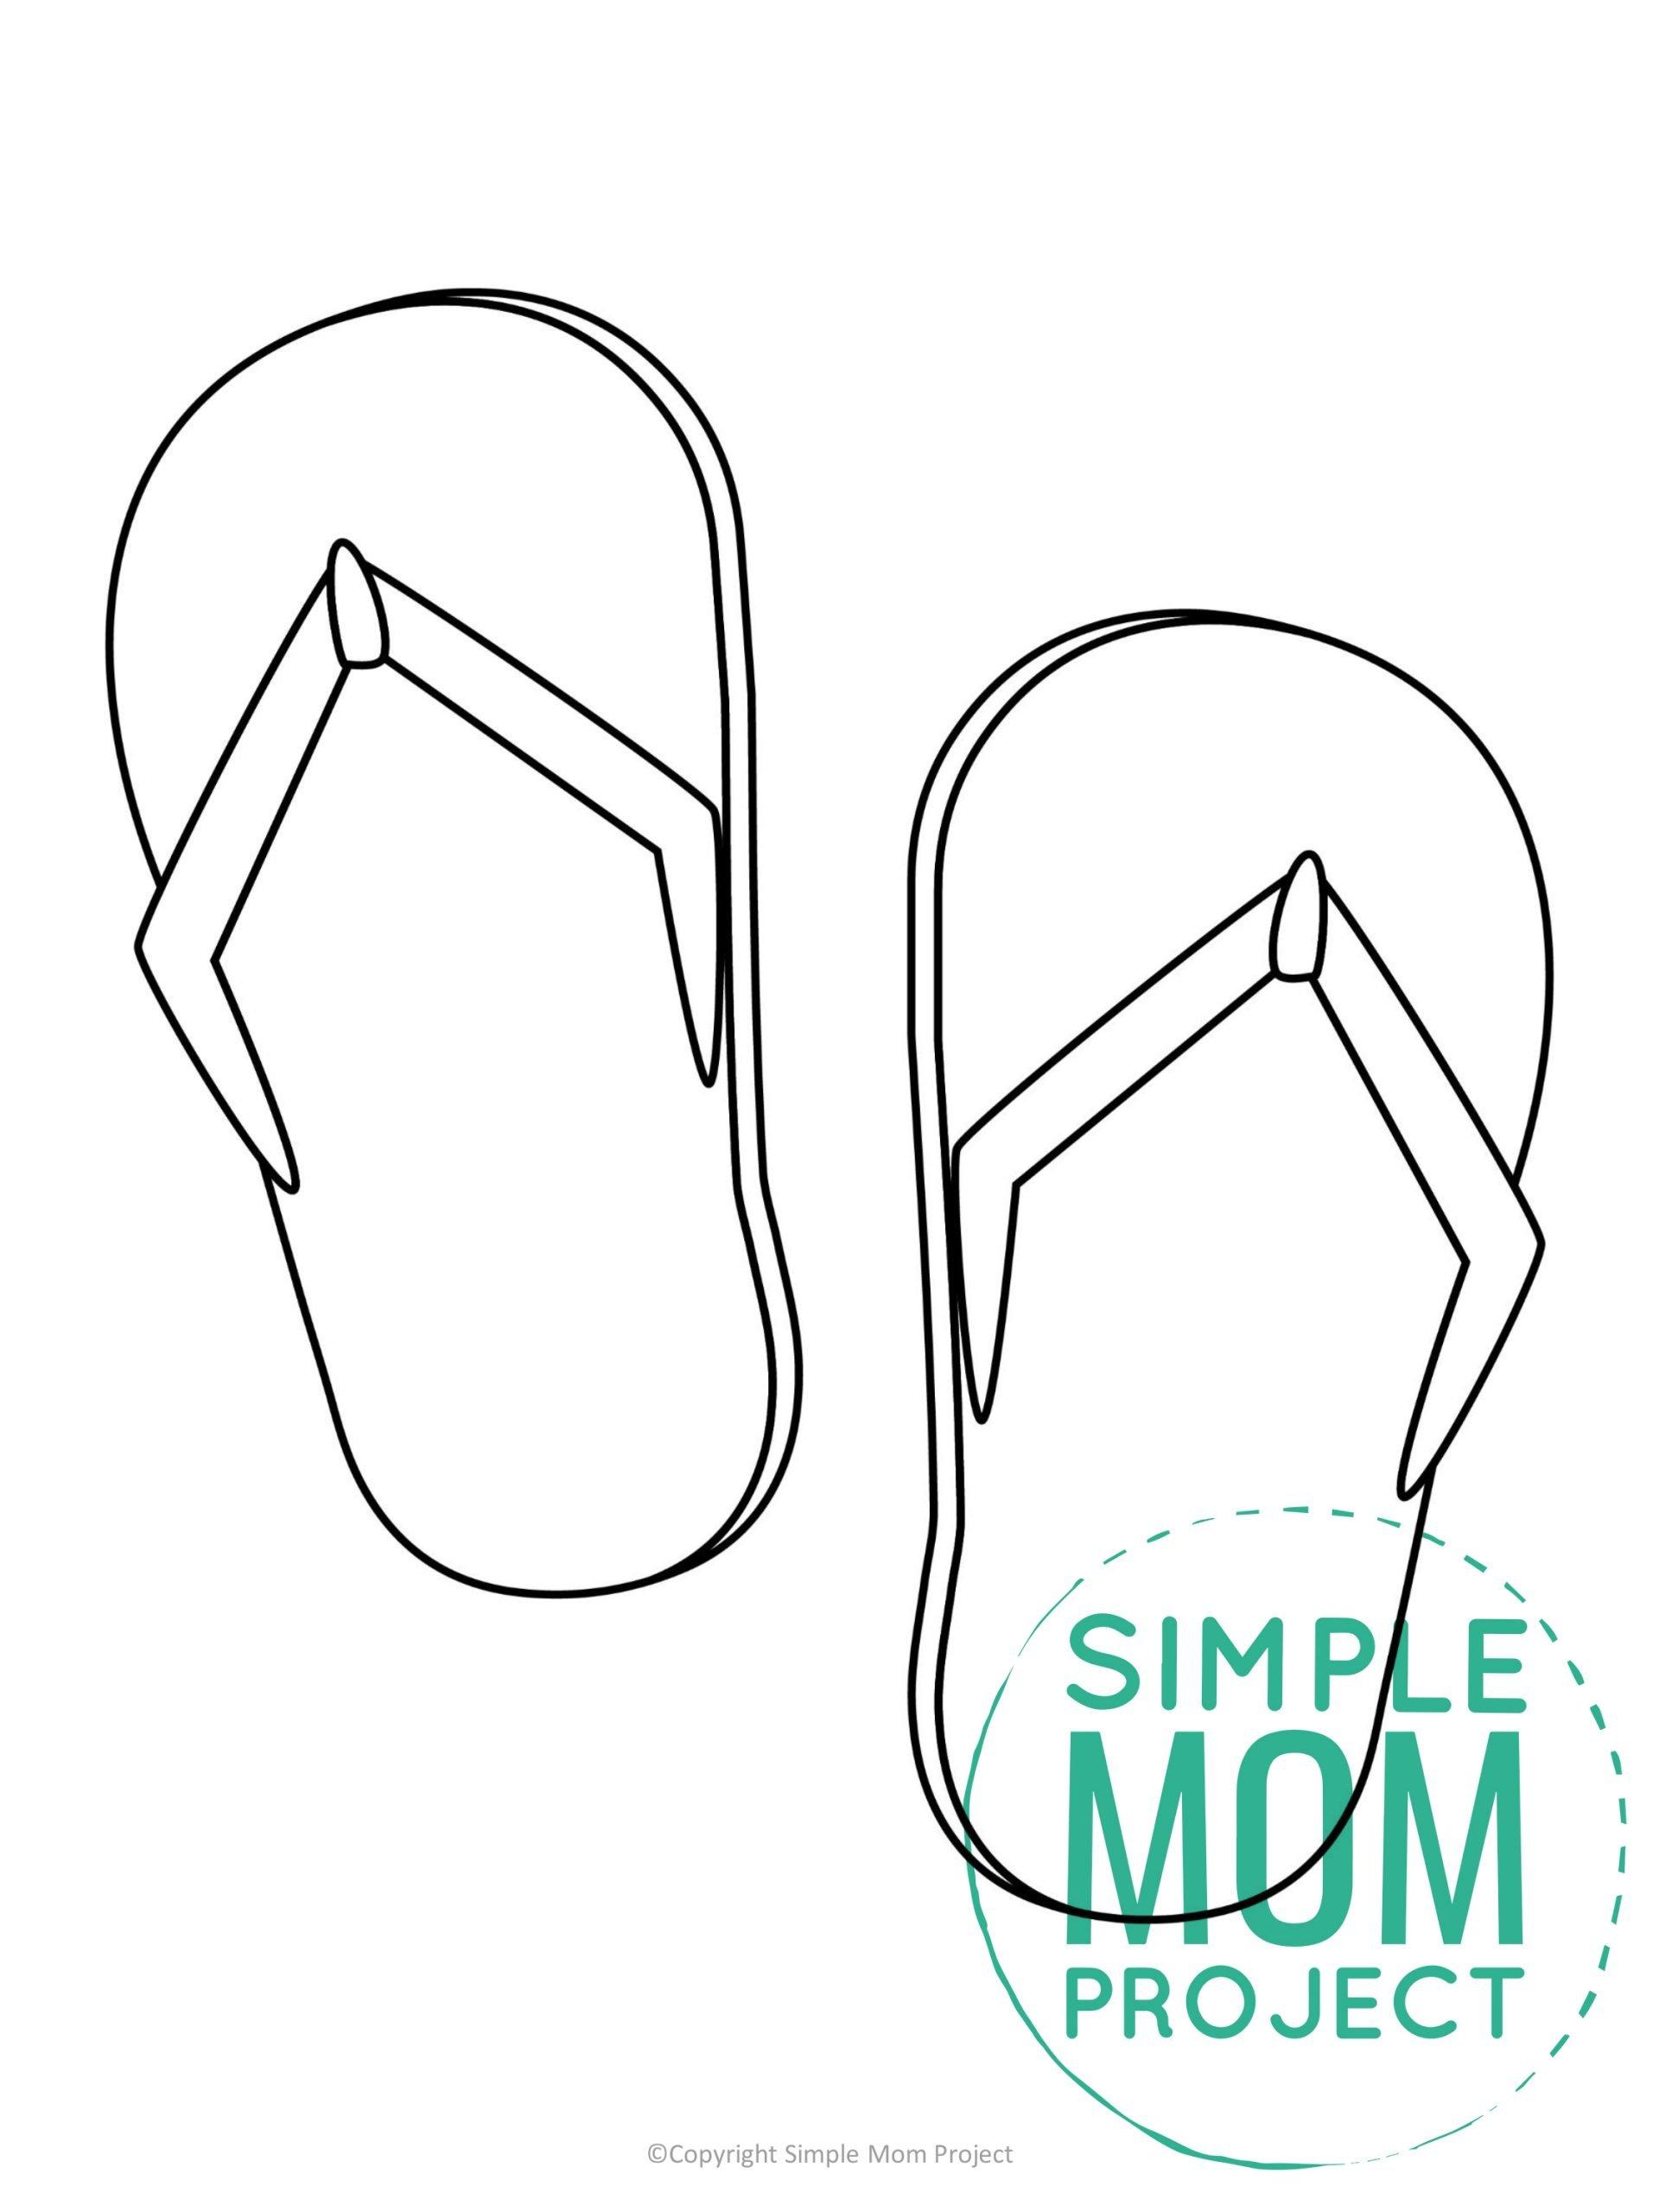 Free printable flip flops template for kids, preschoolers, and toddlers